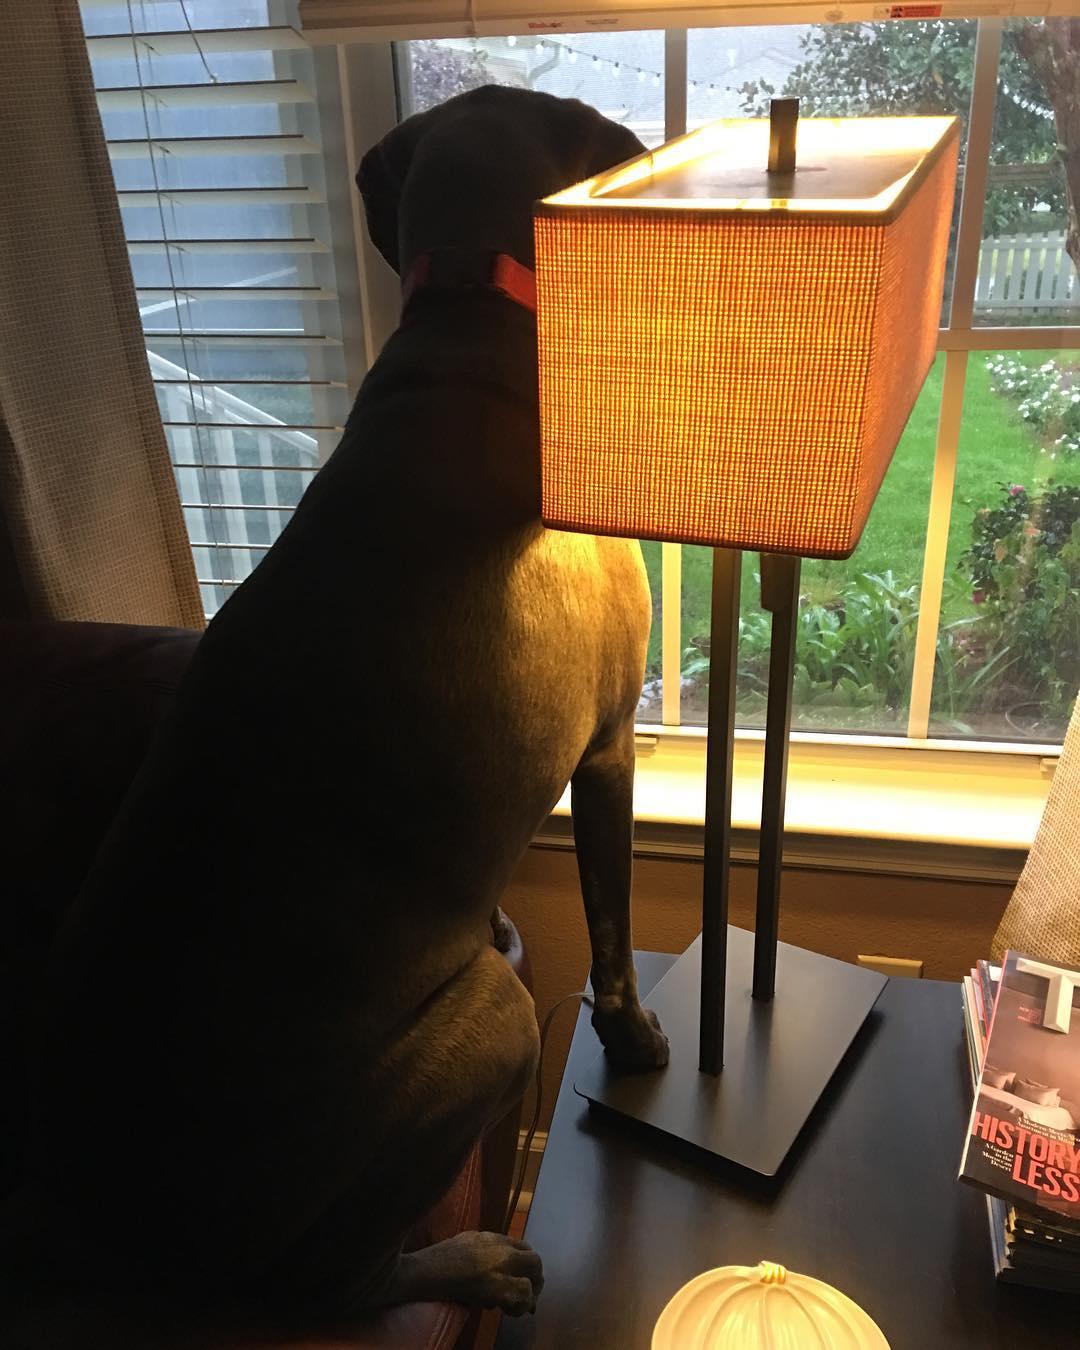 dog sitting on lamp